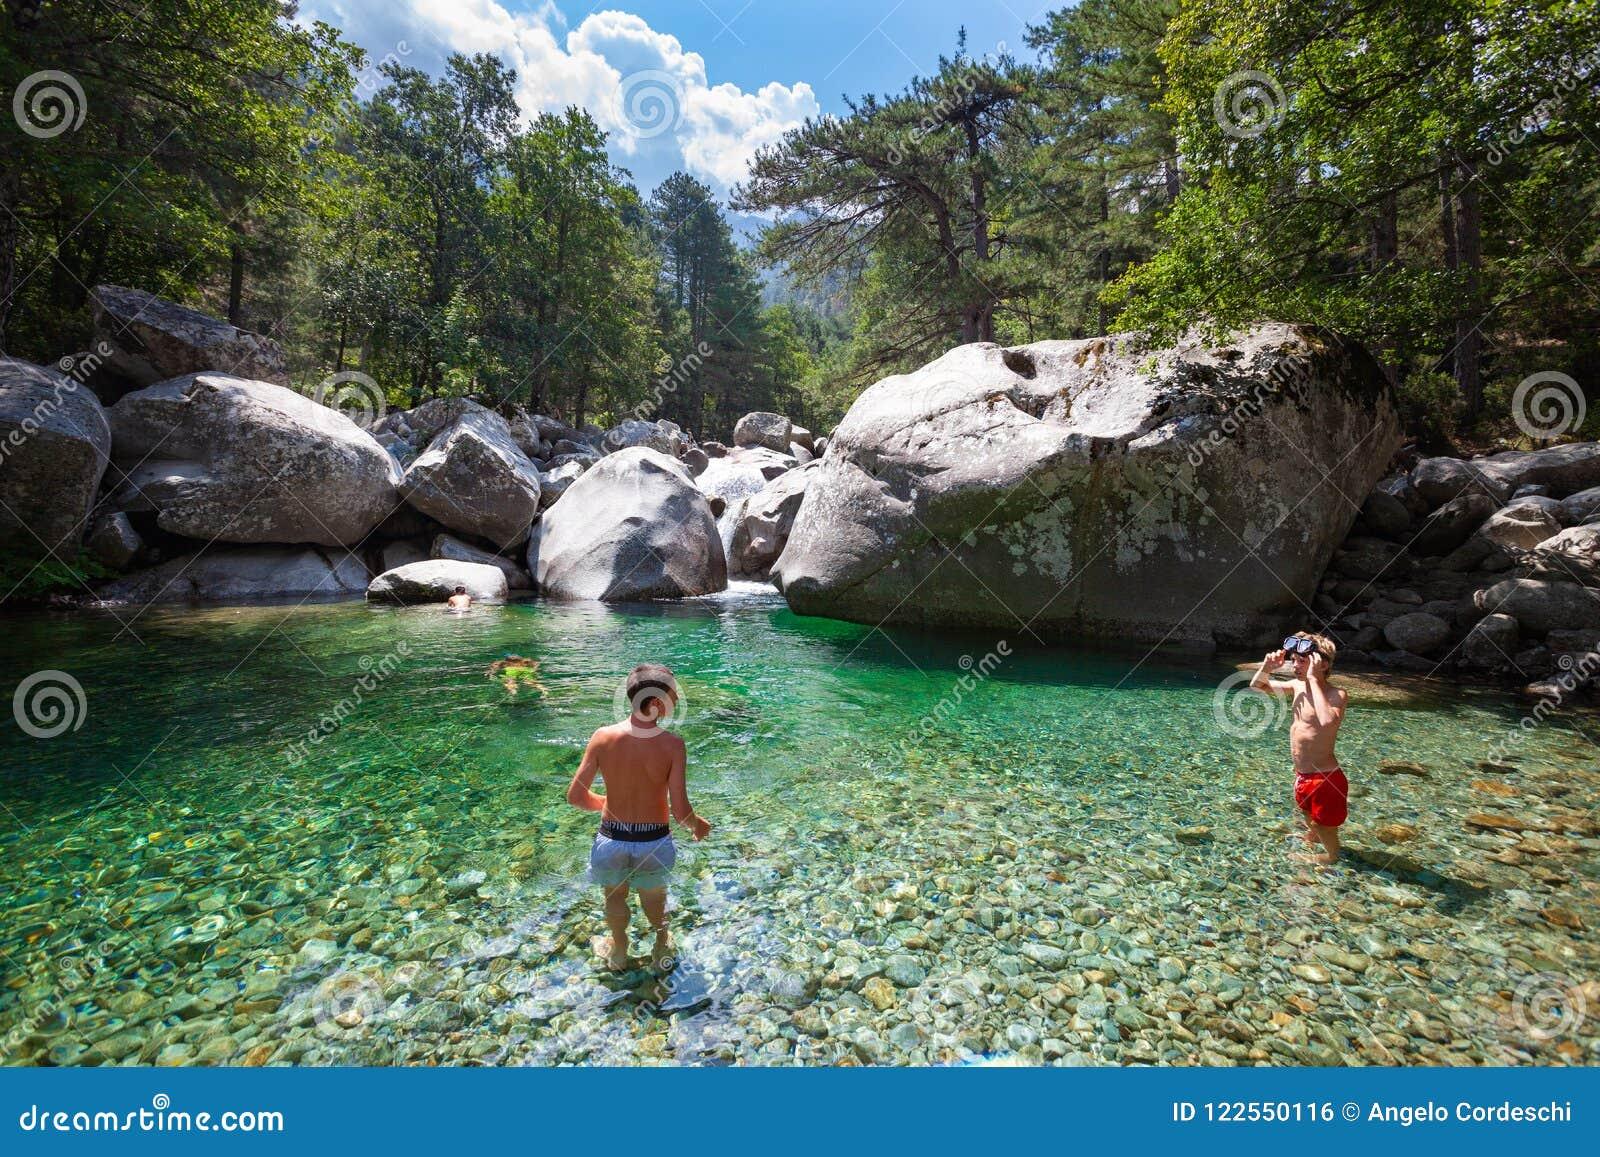 River in a natural landscape, some children inside water.